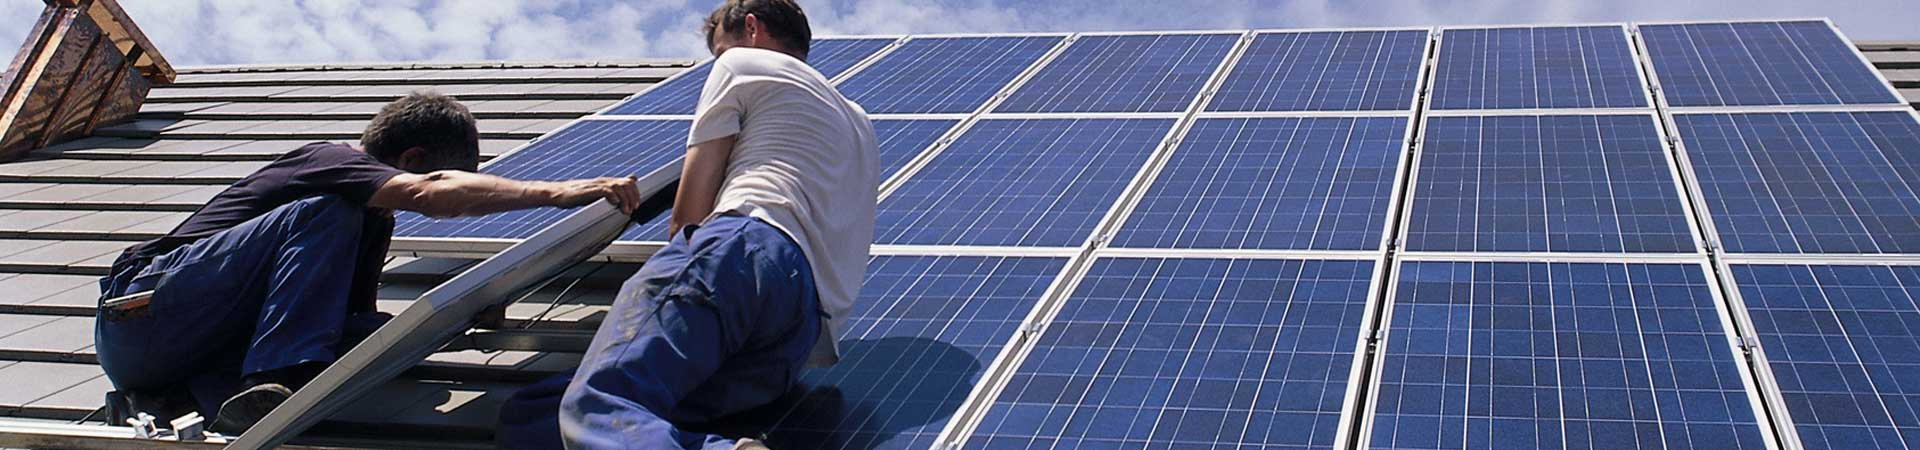 Energiegewinnung, Solar